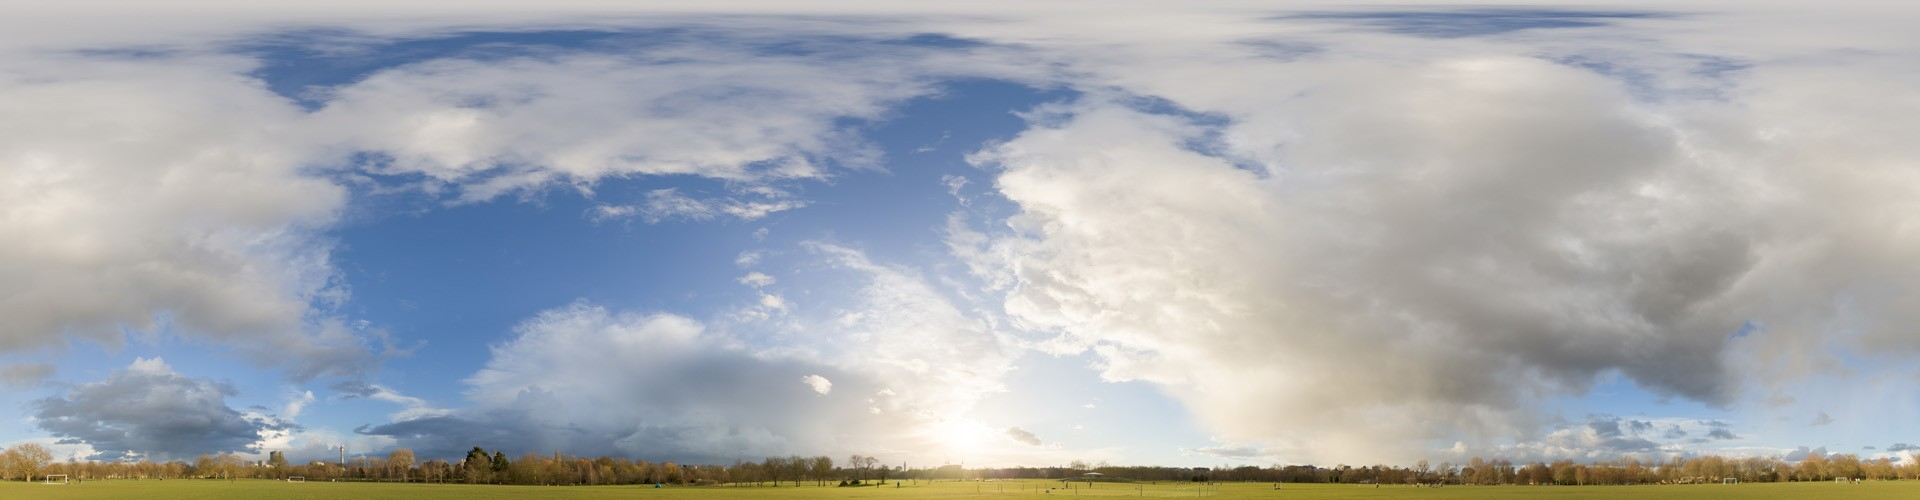 Rainy Clouds 3830 (30k) HDRI